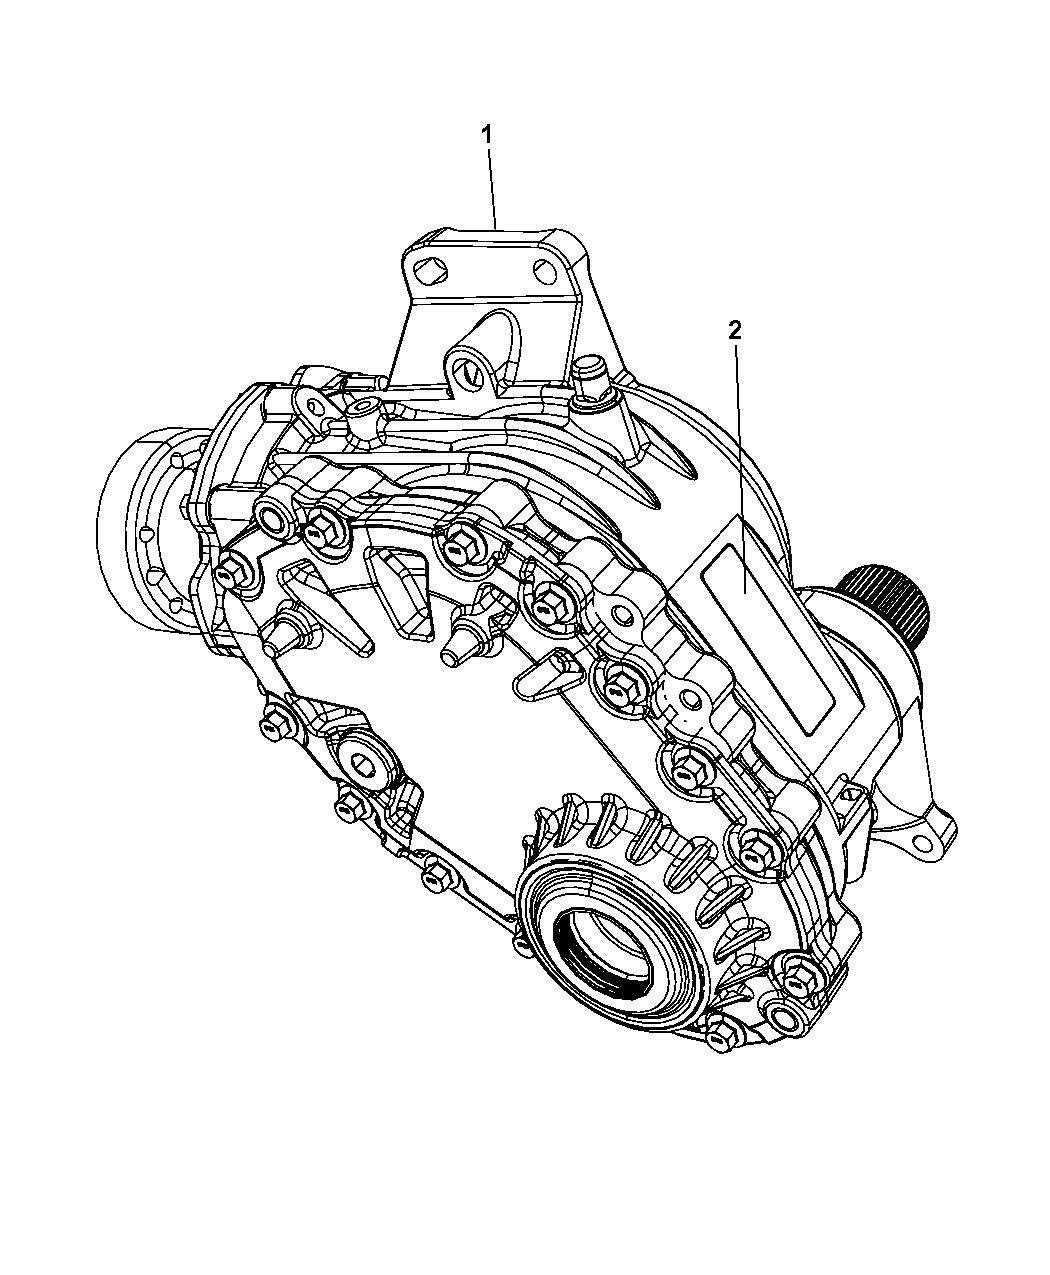 2008 Chrysler Pacifica Power Transfer Unit  U0026 Identification